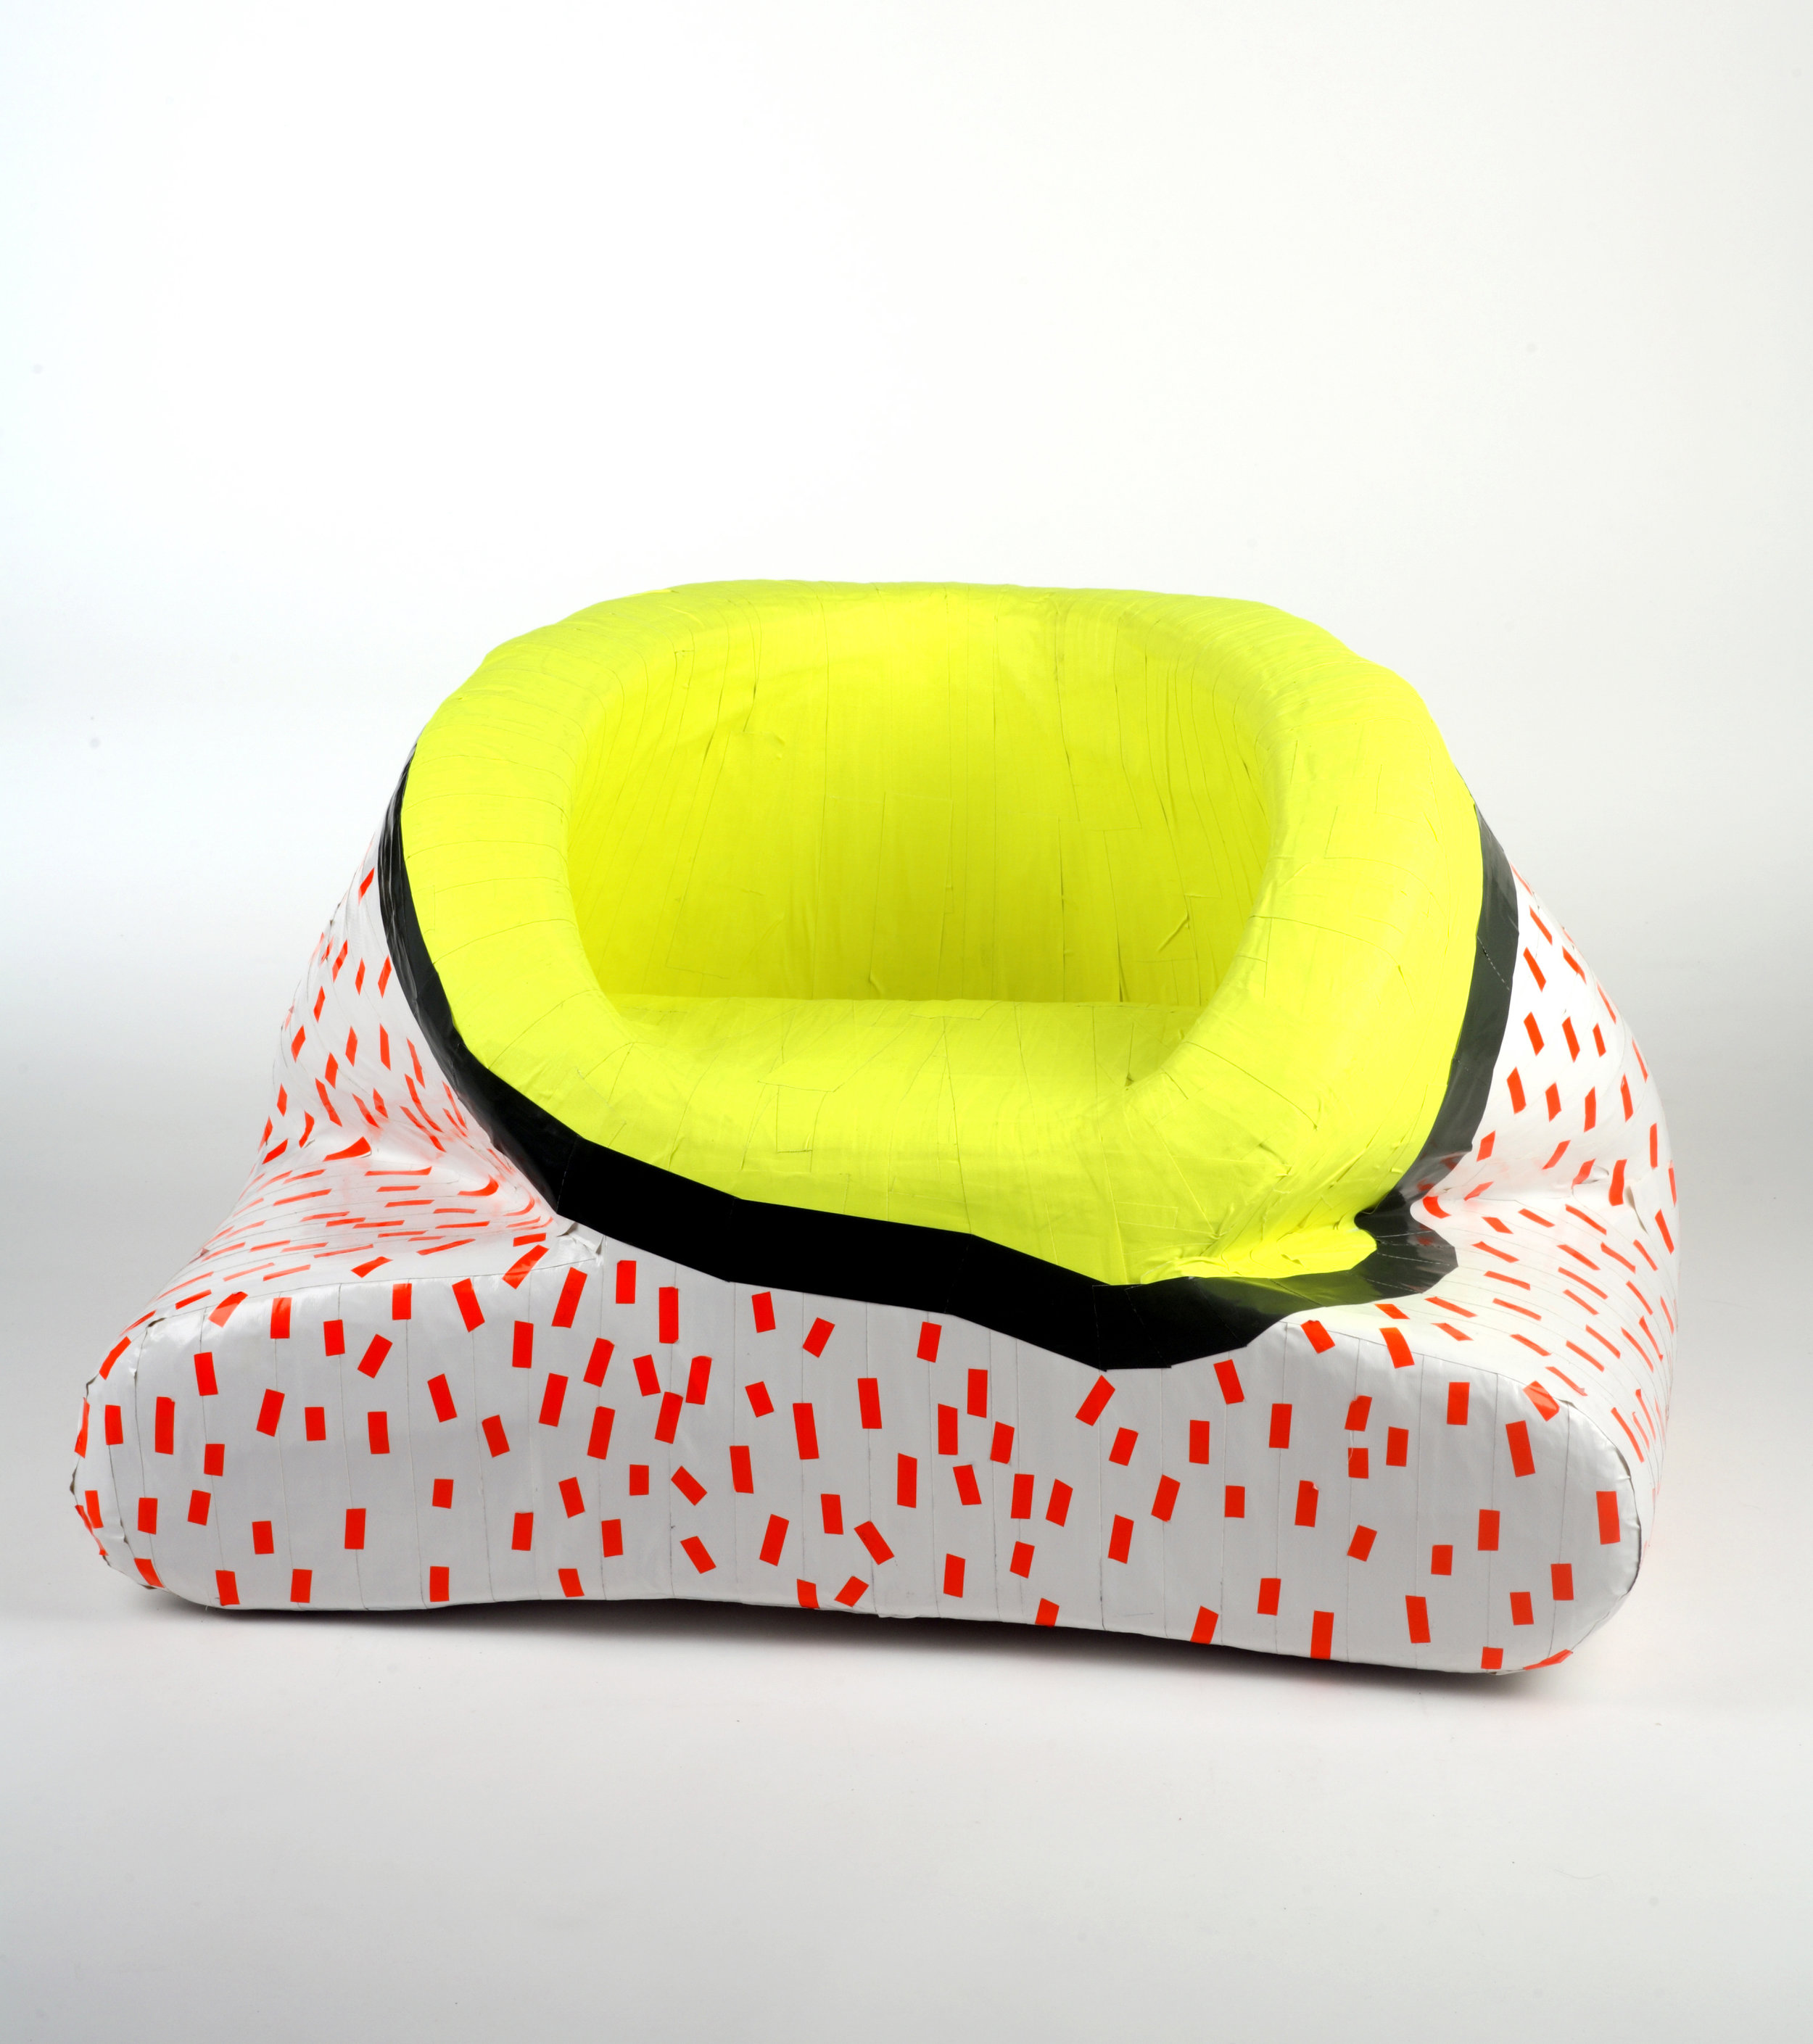 top to bottom Tape Chairs 1/2/3  Foam mattress, cardboard & gaffer tape